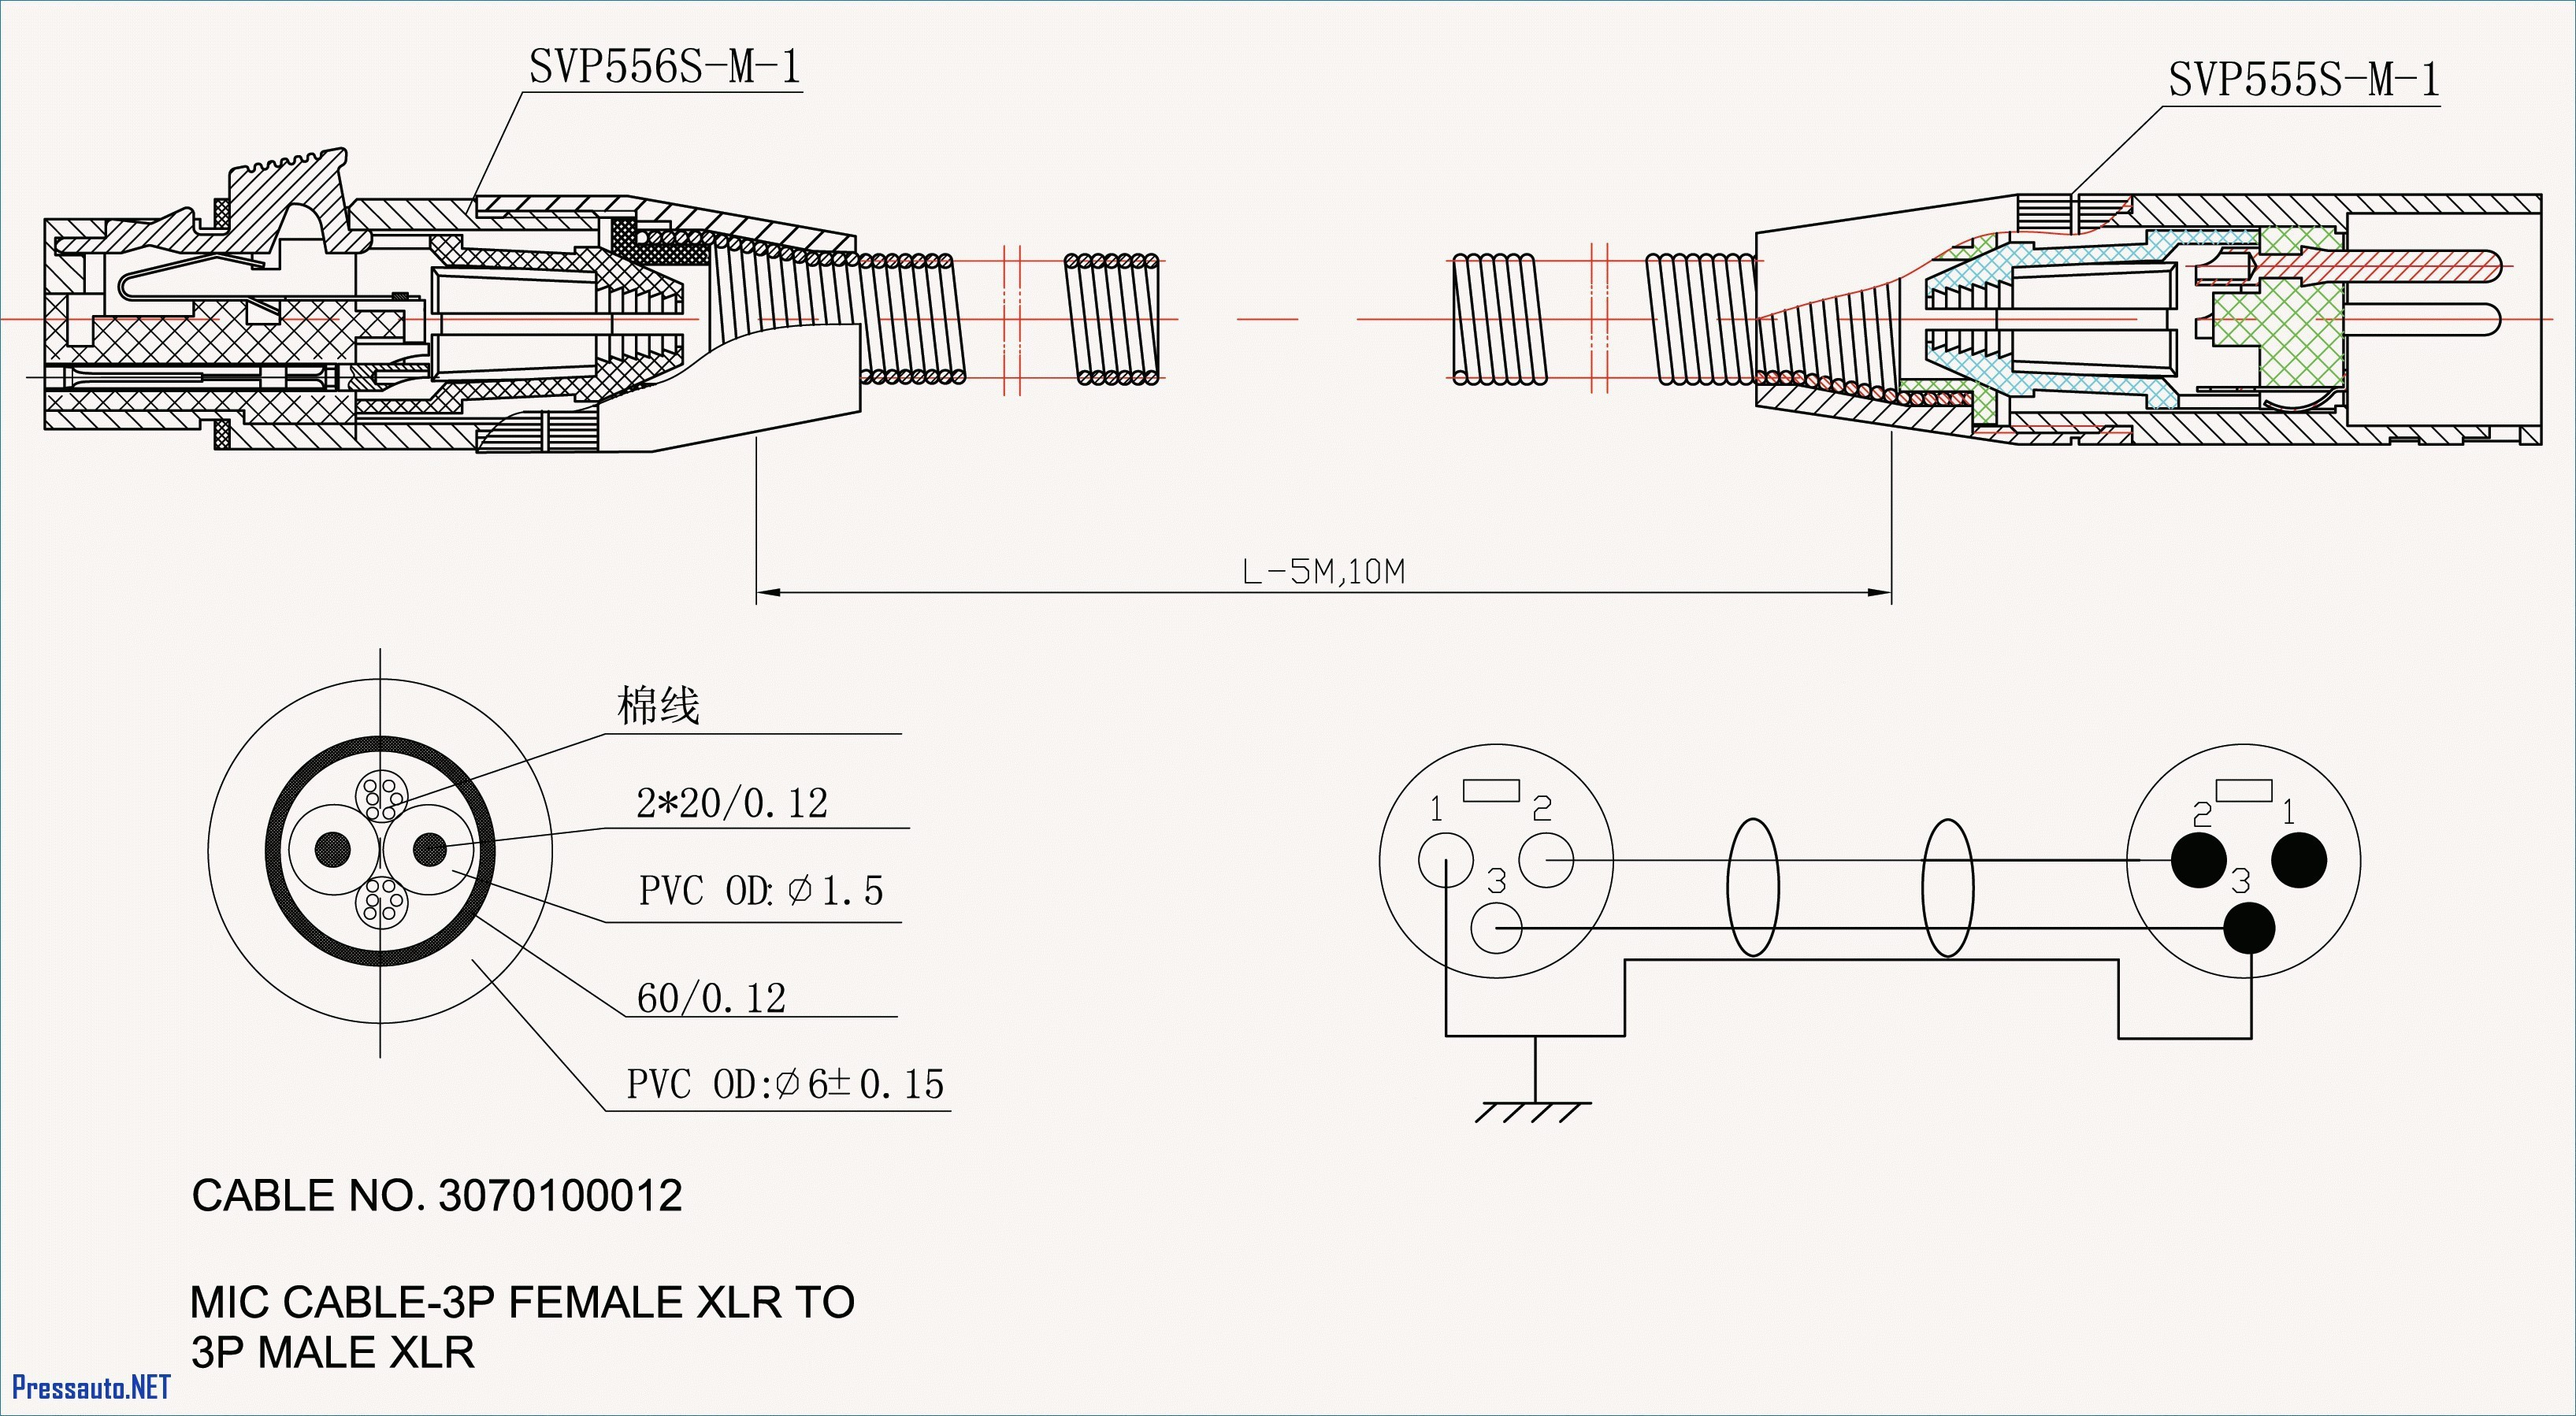 Car Ignition Switch Wiring Diagram Car Ignition Switch Wiring Diagram Pickenscountymedicalcenter Of Car Ignition Switch Wiring Diagram Nissan Ignition Switch Wiring Diagram Valid 1995 ford F150 Ignition